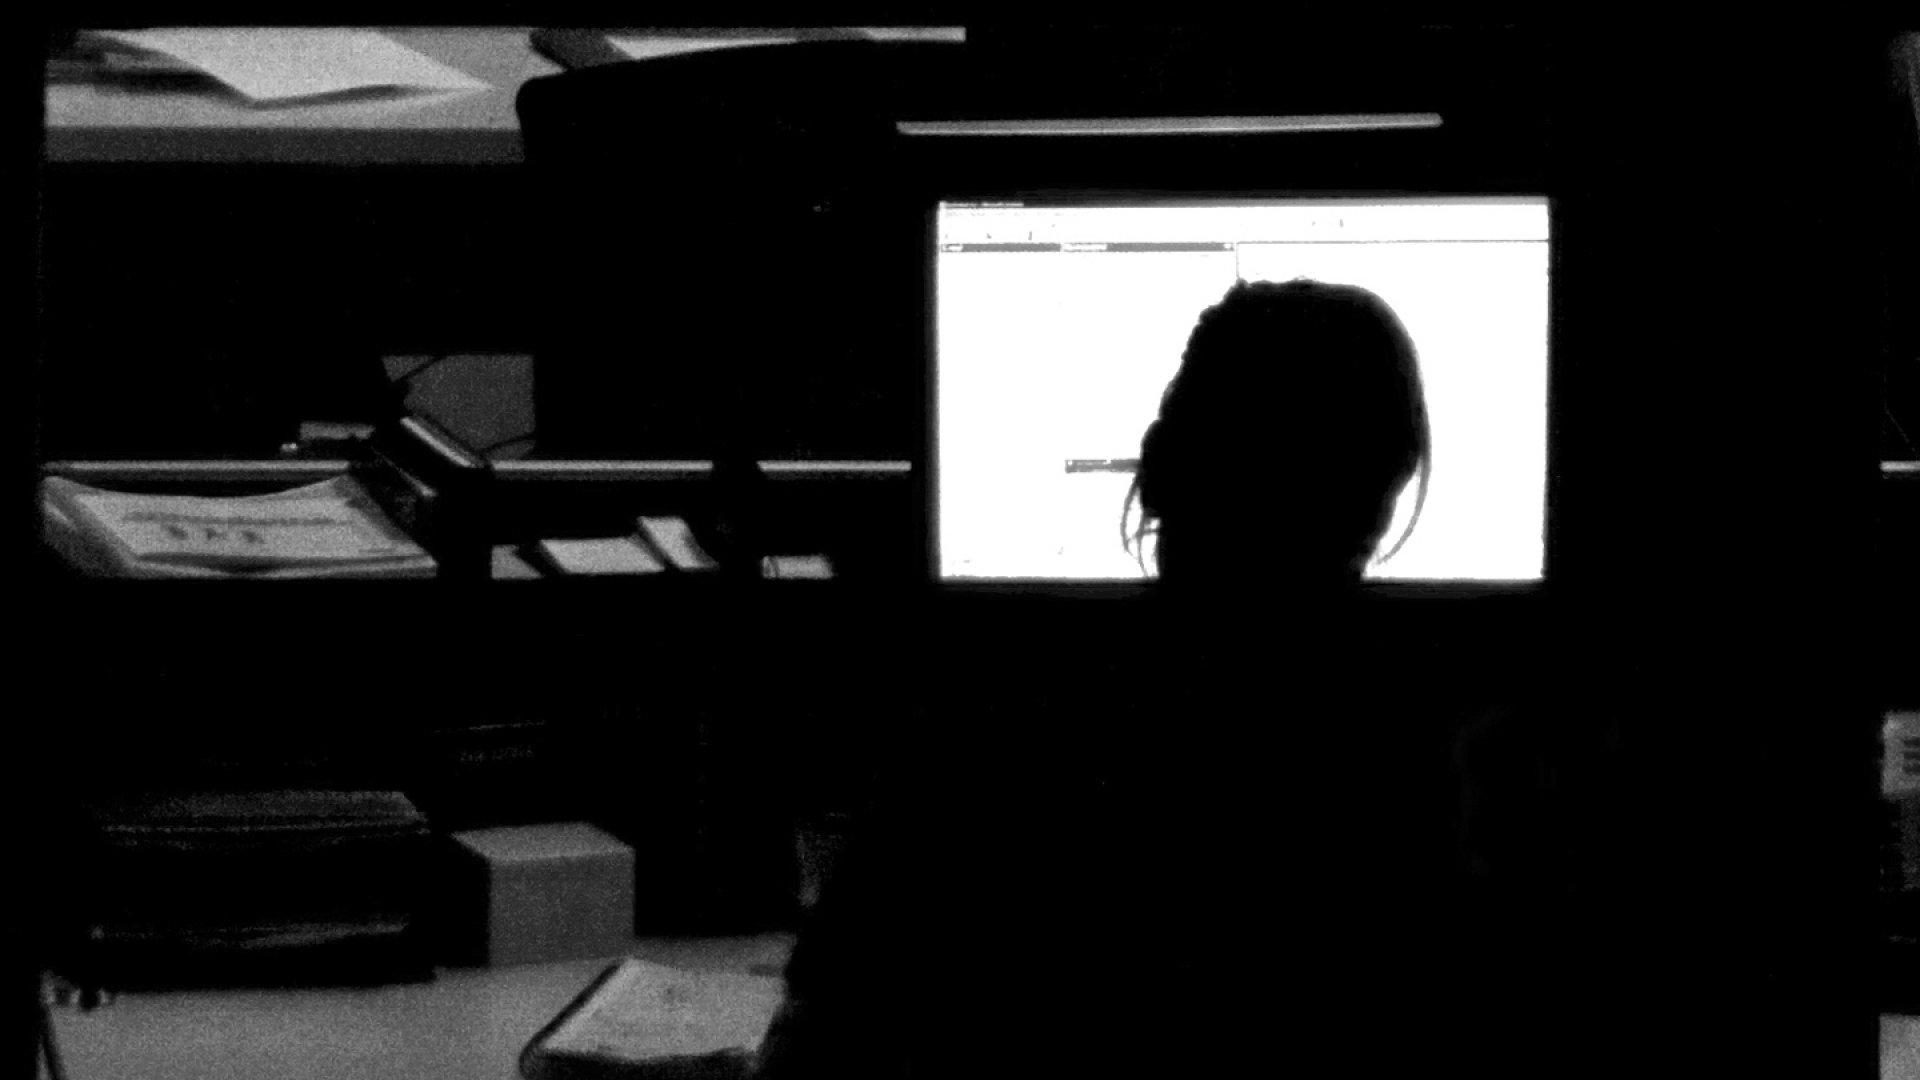 Open-Plan Office: An Introvert's Worse Nightmare